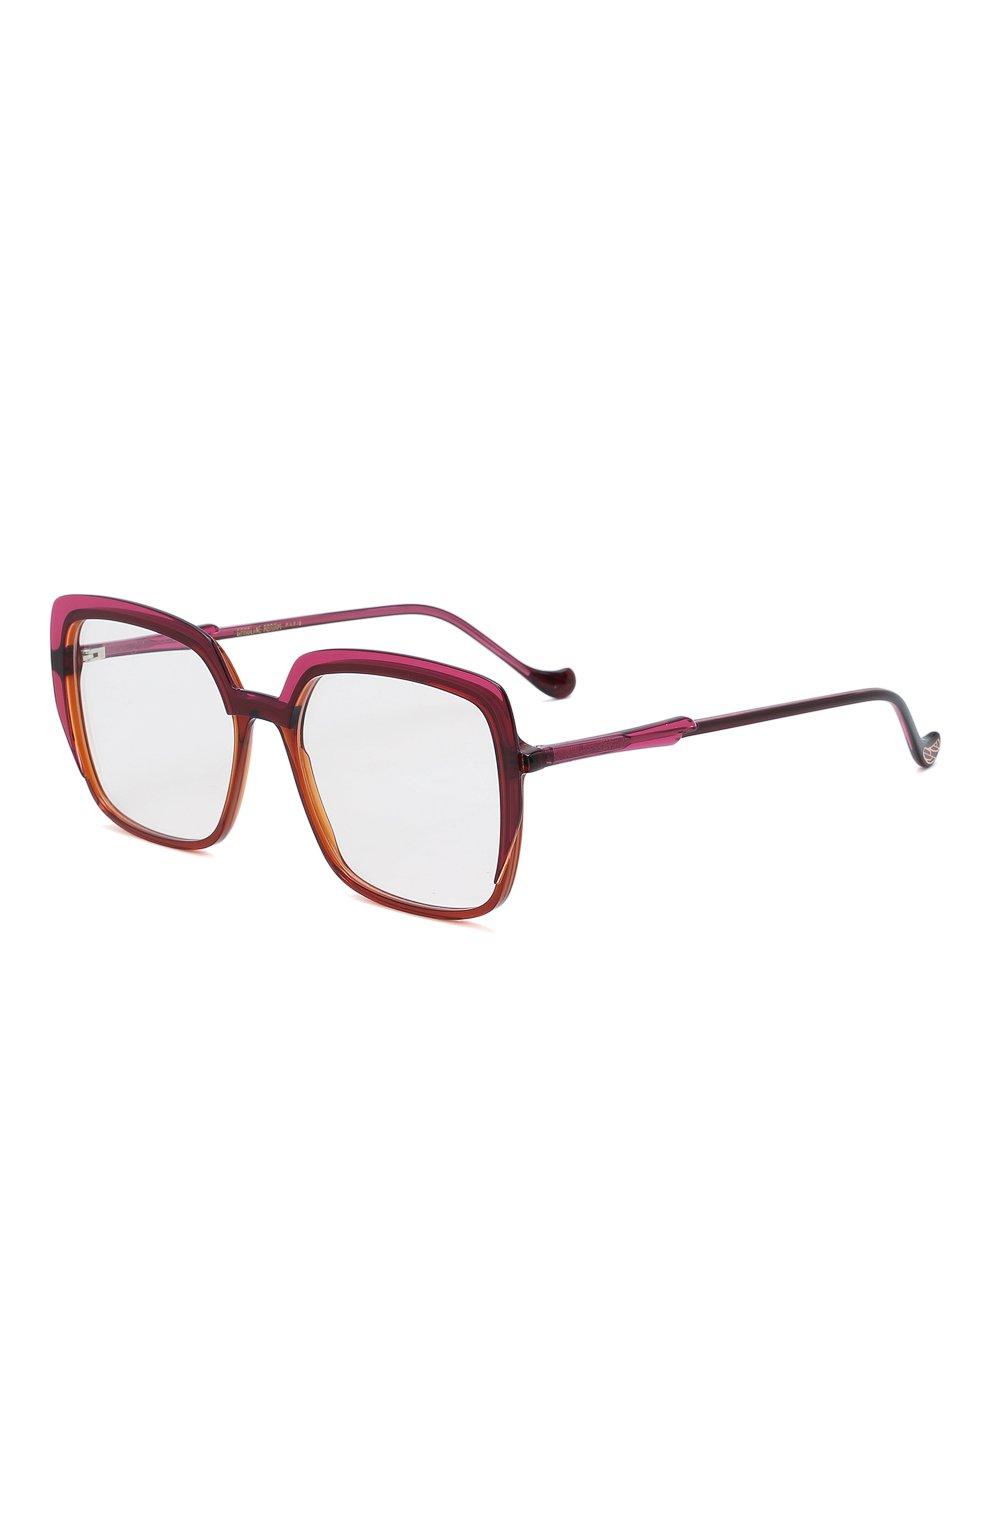 Женские оправа CAROLINE ABRAM темно-розового цвета, арт. ELEKTRA 737 | Фото 1 (Тип очков: Оправа; Очки форма: Квадратные, Бабочка; Оптика Гендер: оптика-женское)